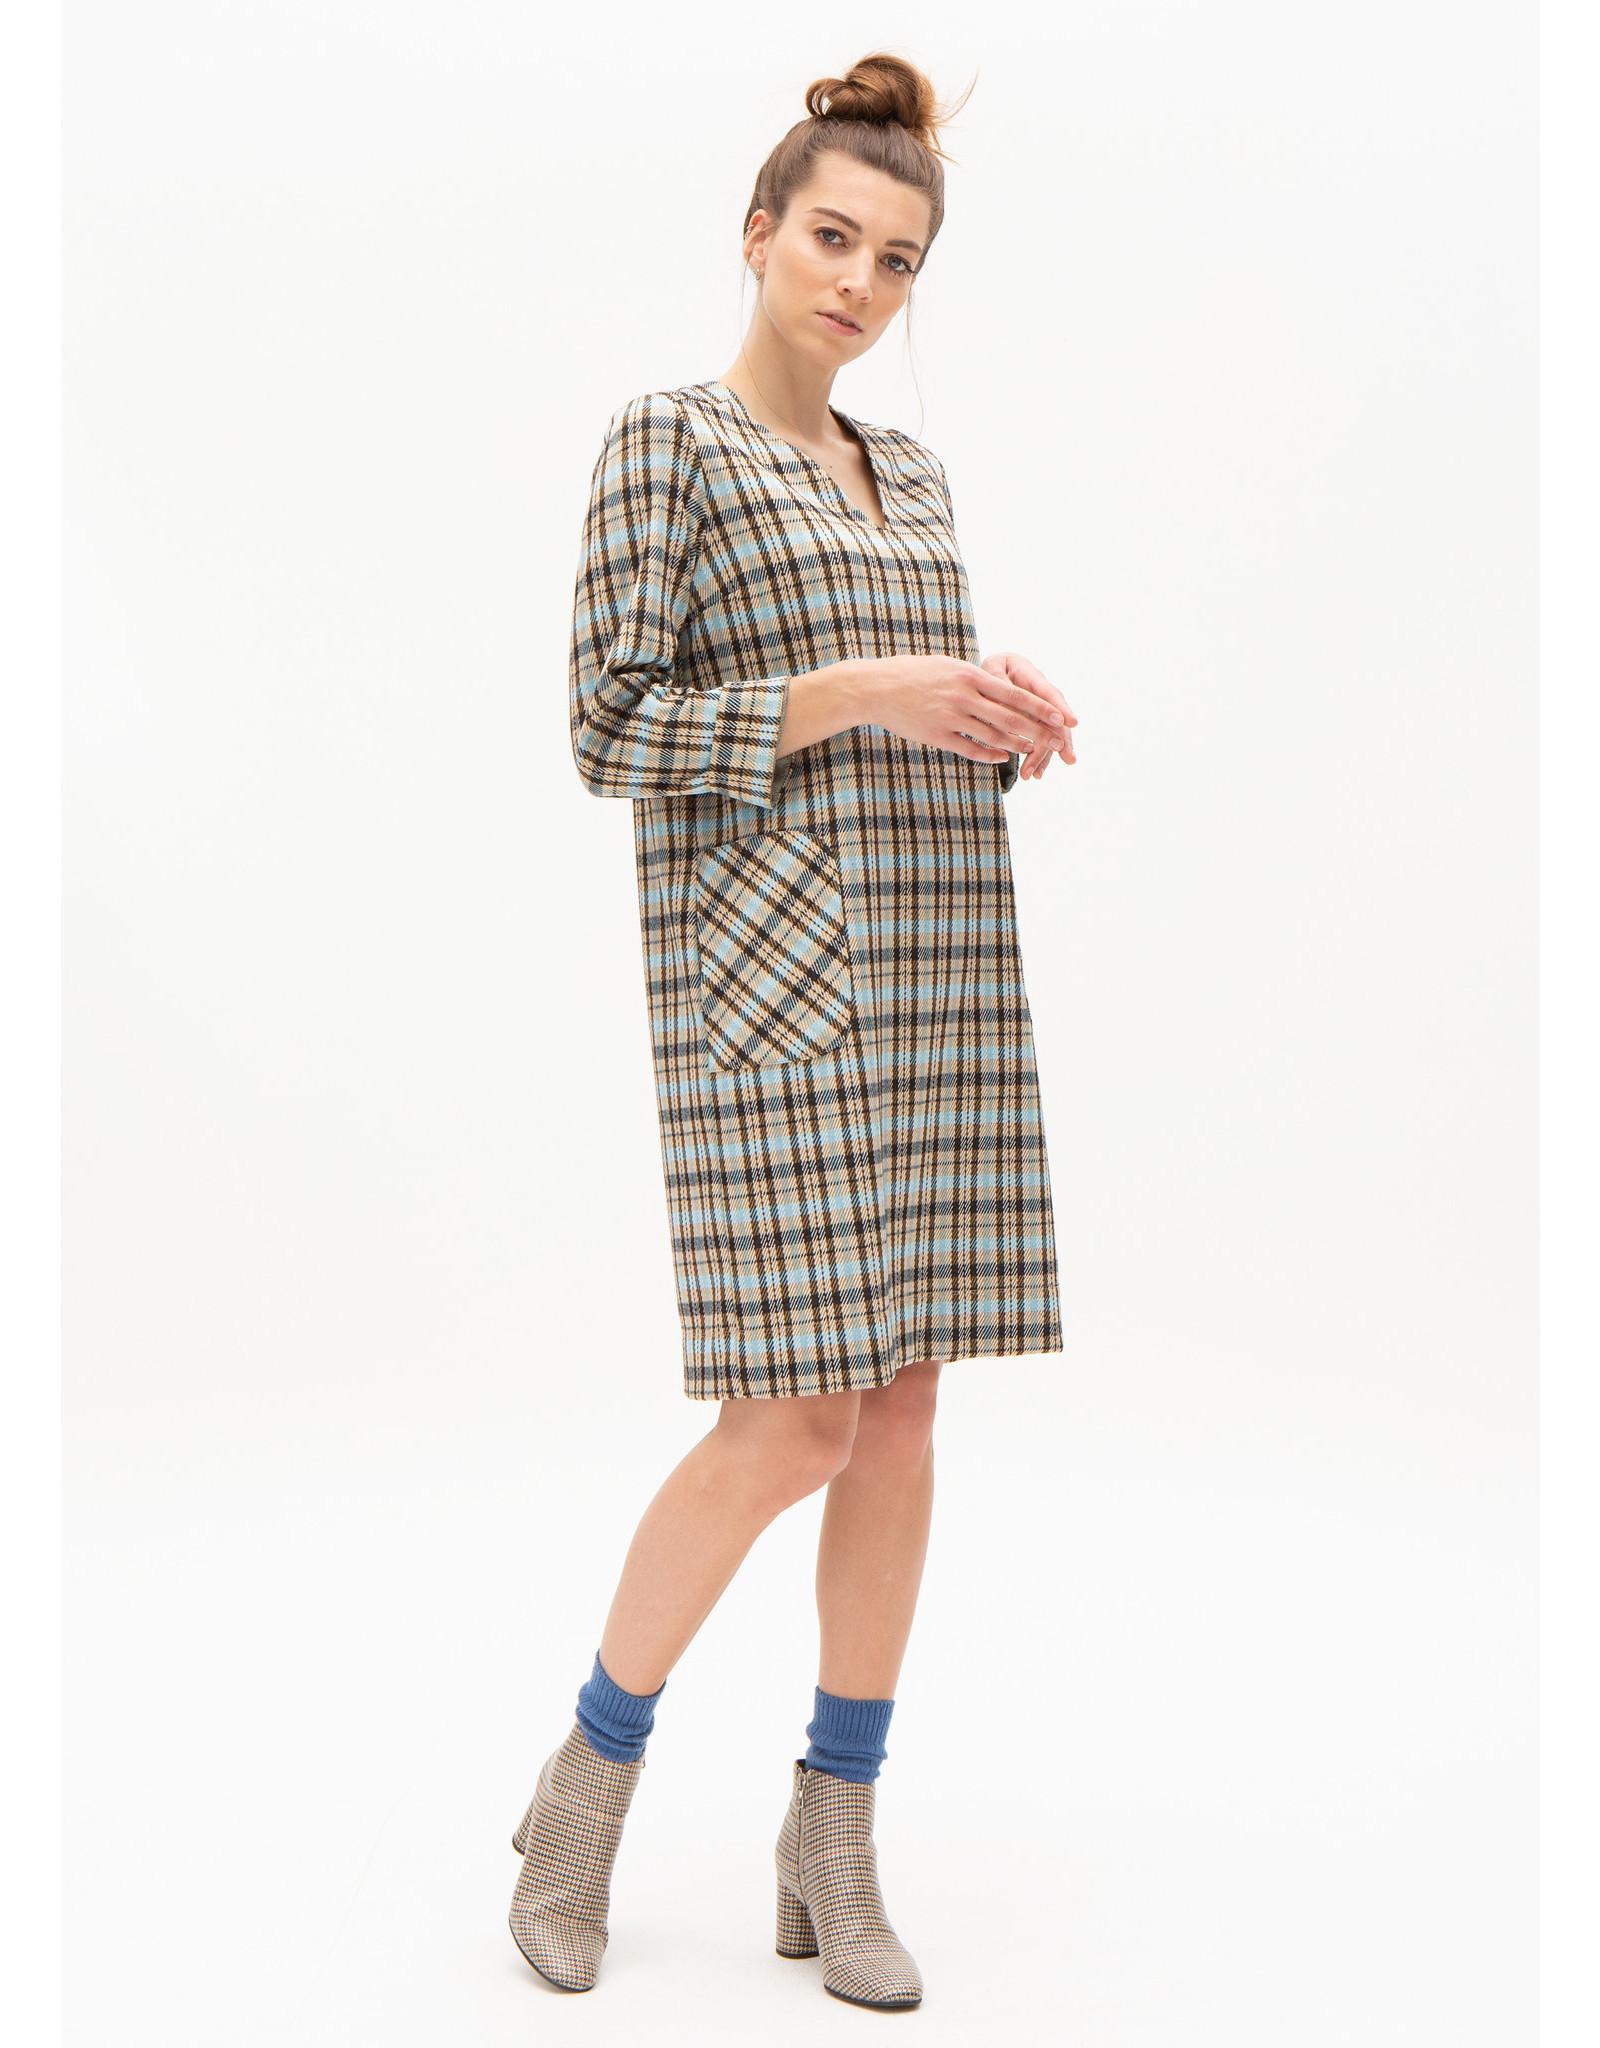 Nathalie  Vleeschouwer Kleedje Tafari Long Sleeves